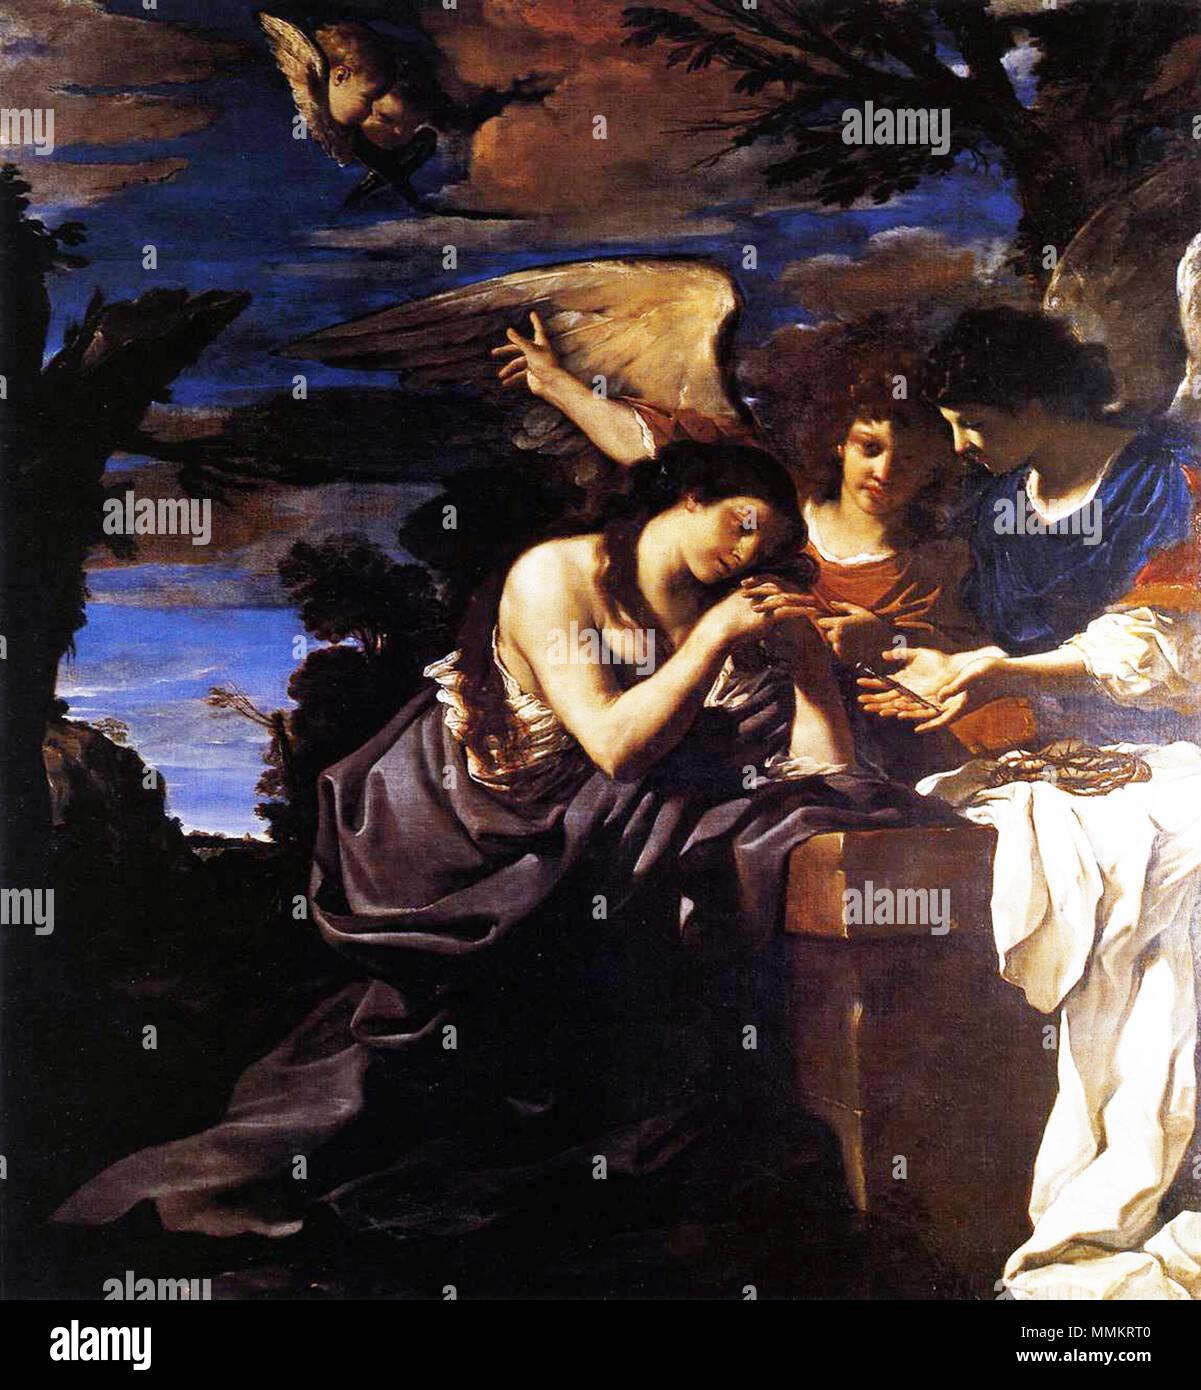 Saint Mary Magdalene Penitent Stockfotos & Saint Mary Magdalene ...